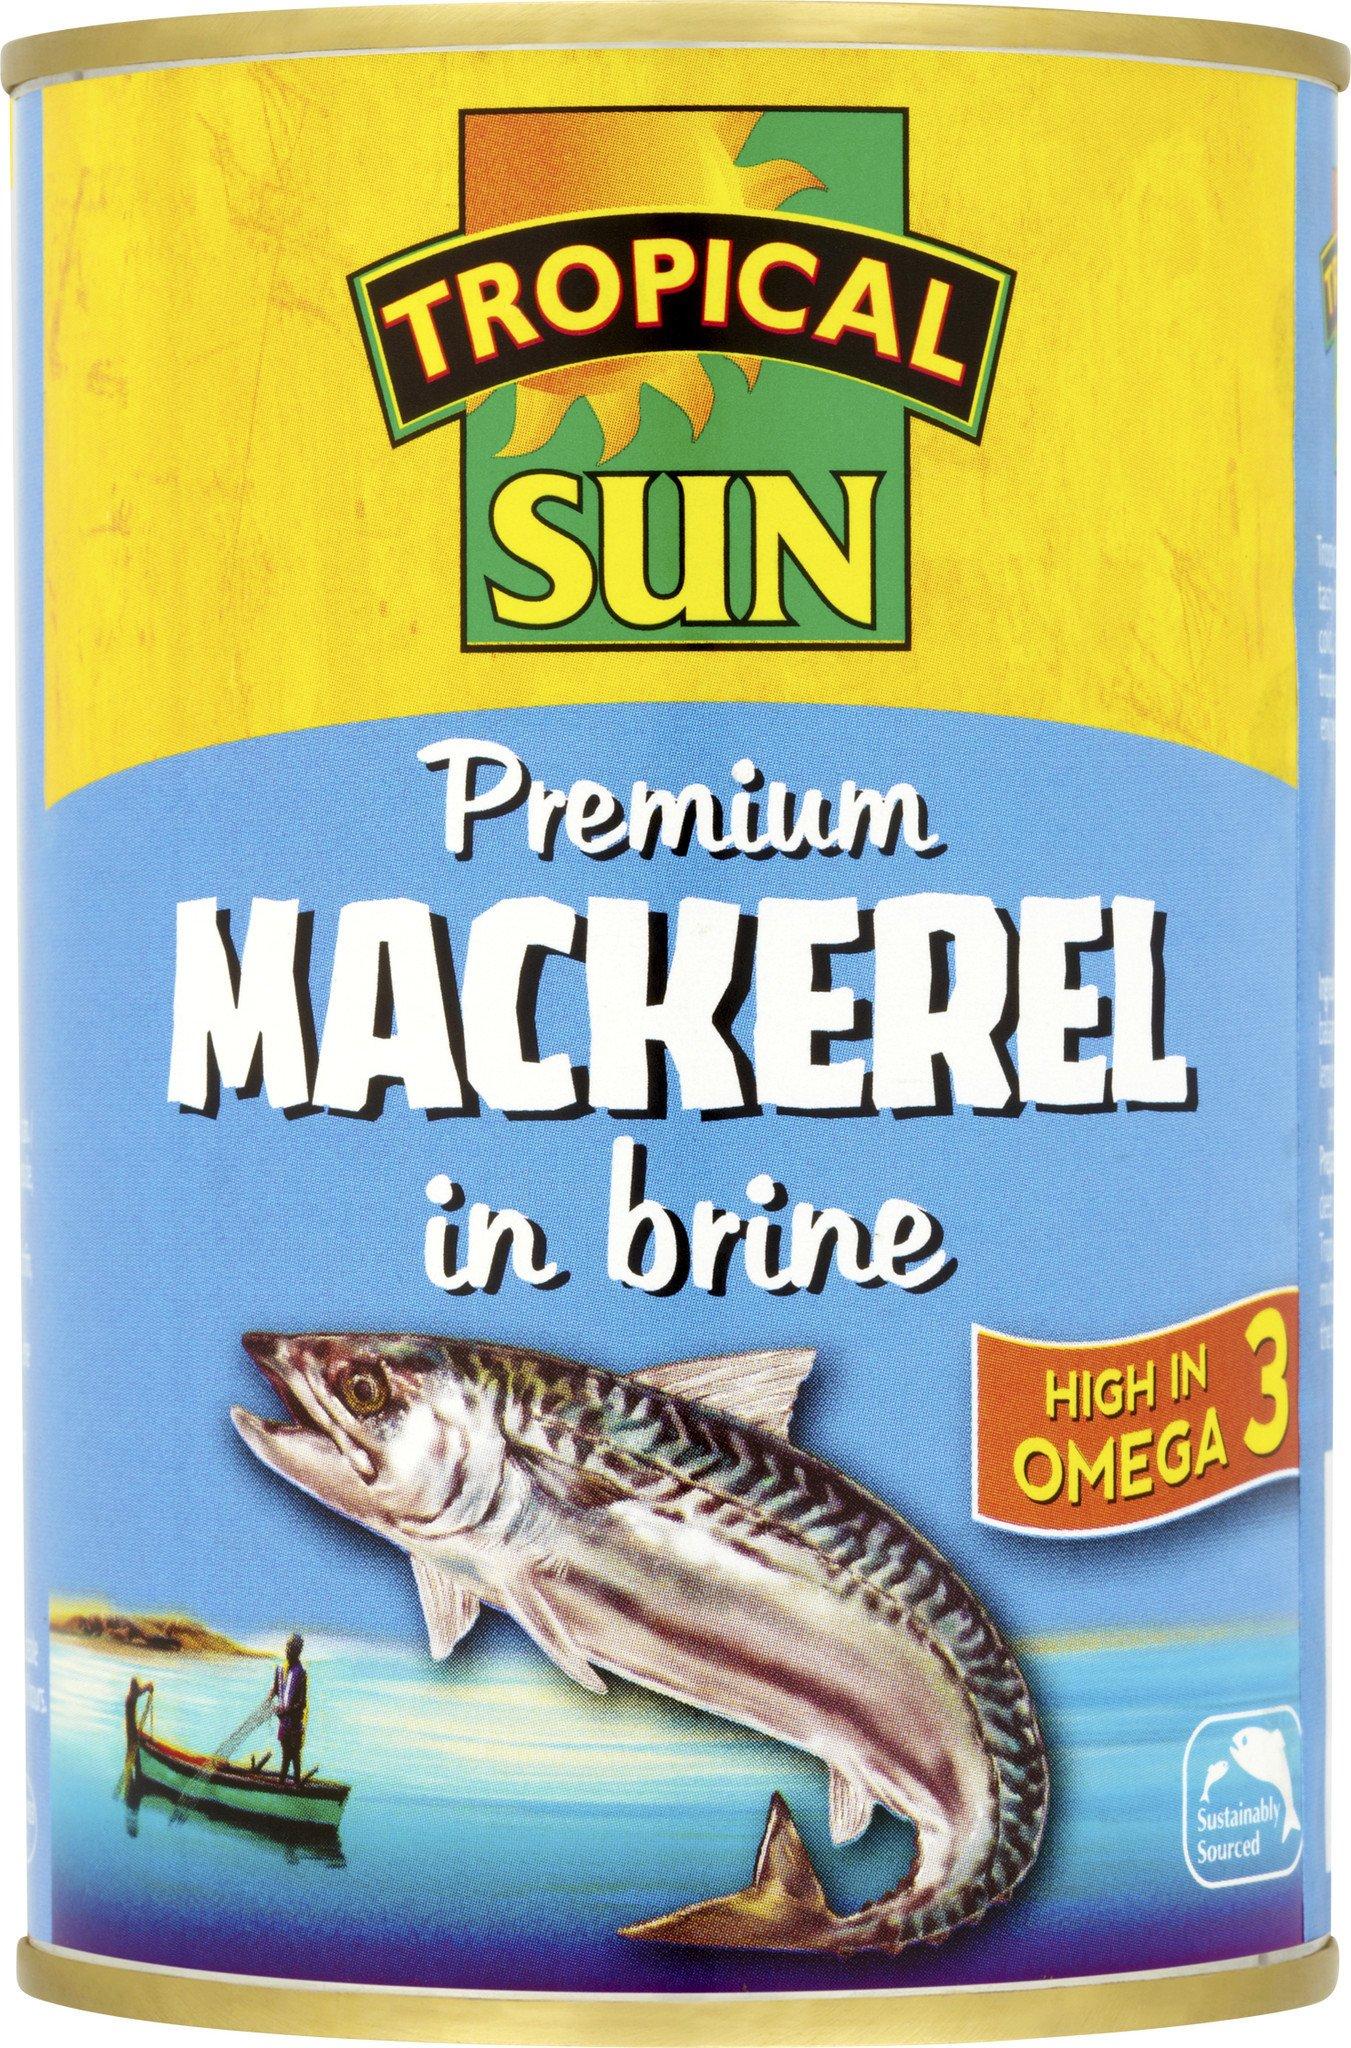 Tropical Sun Mackerel In Brine